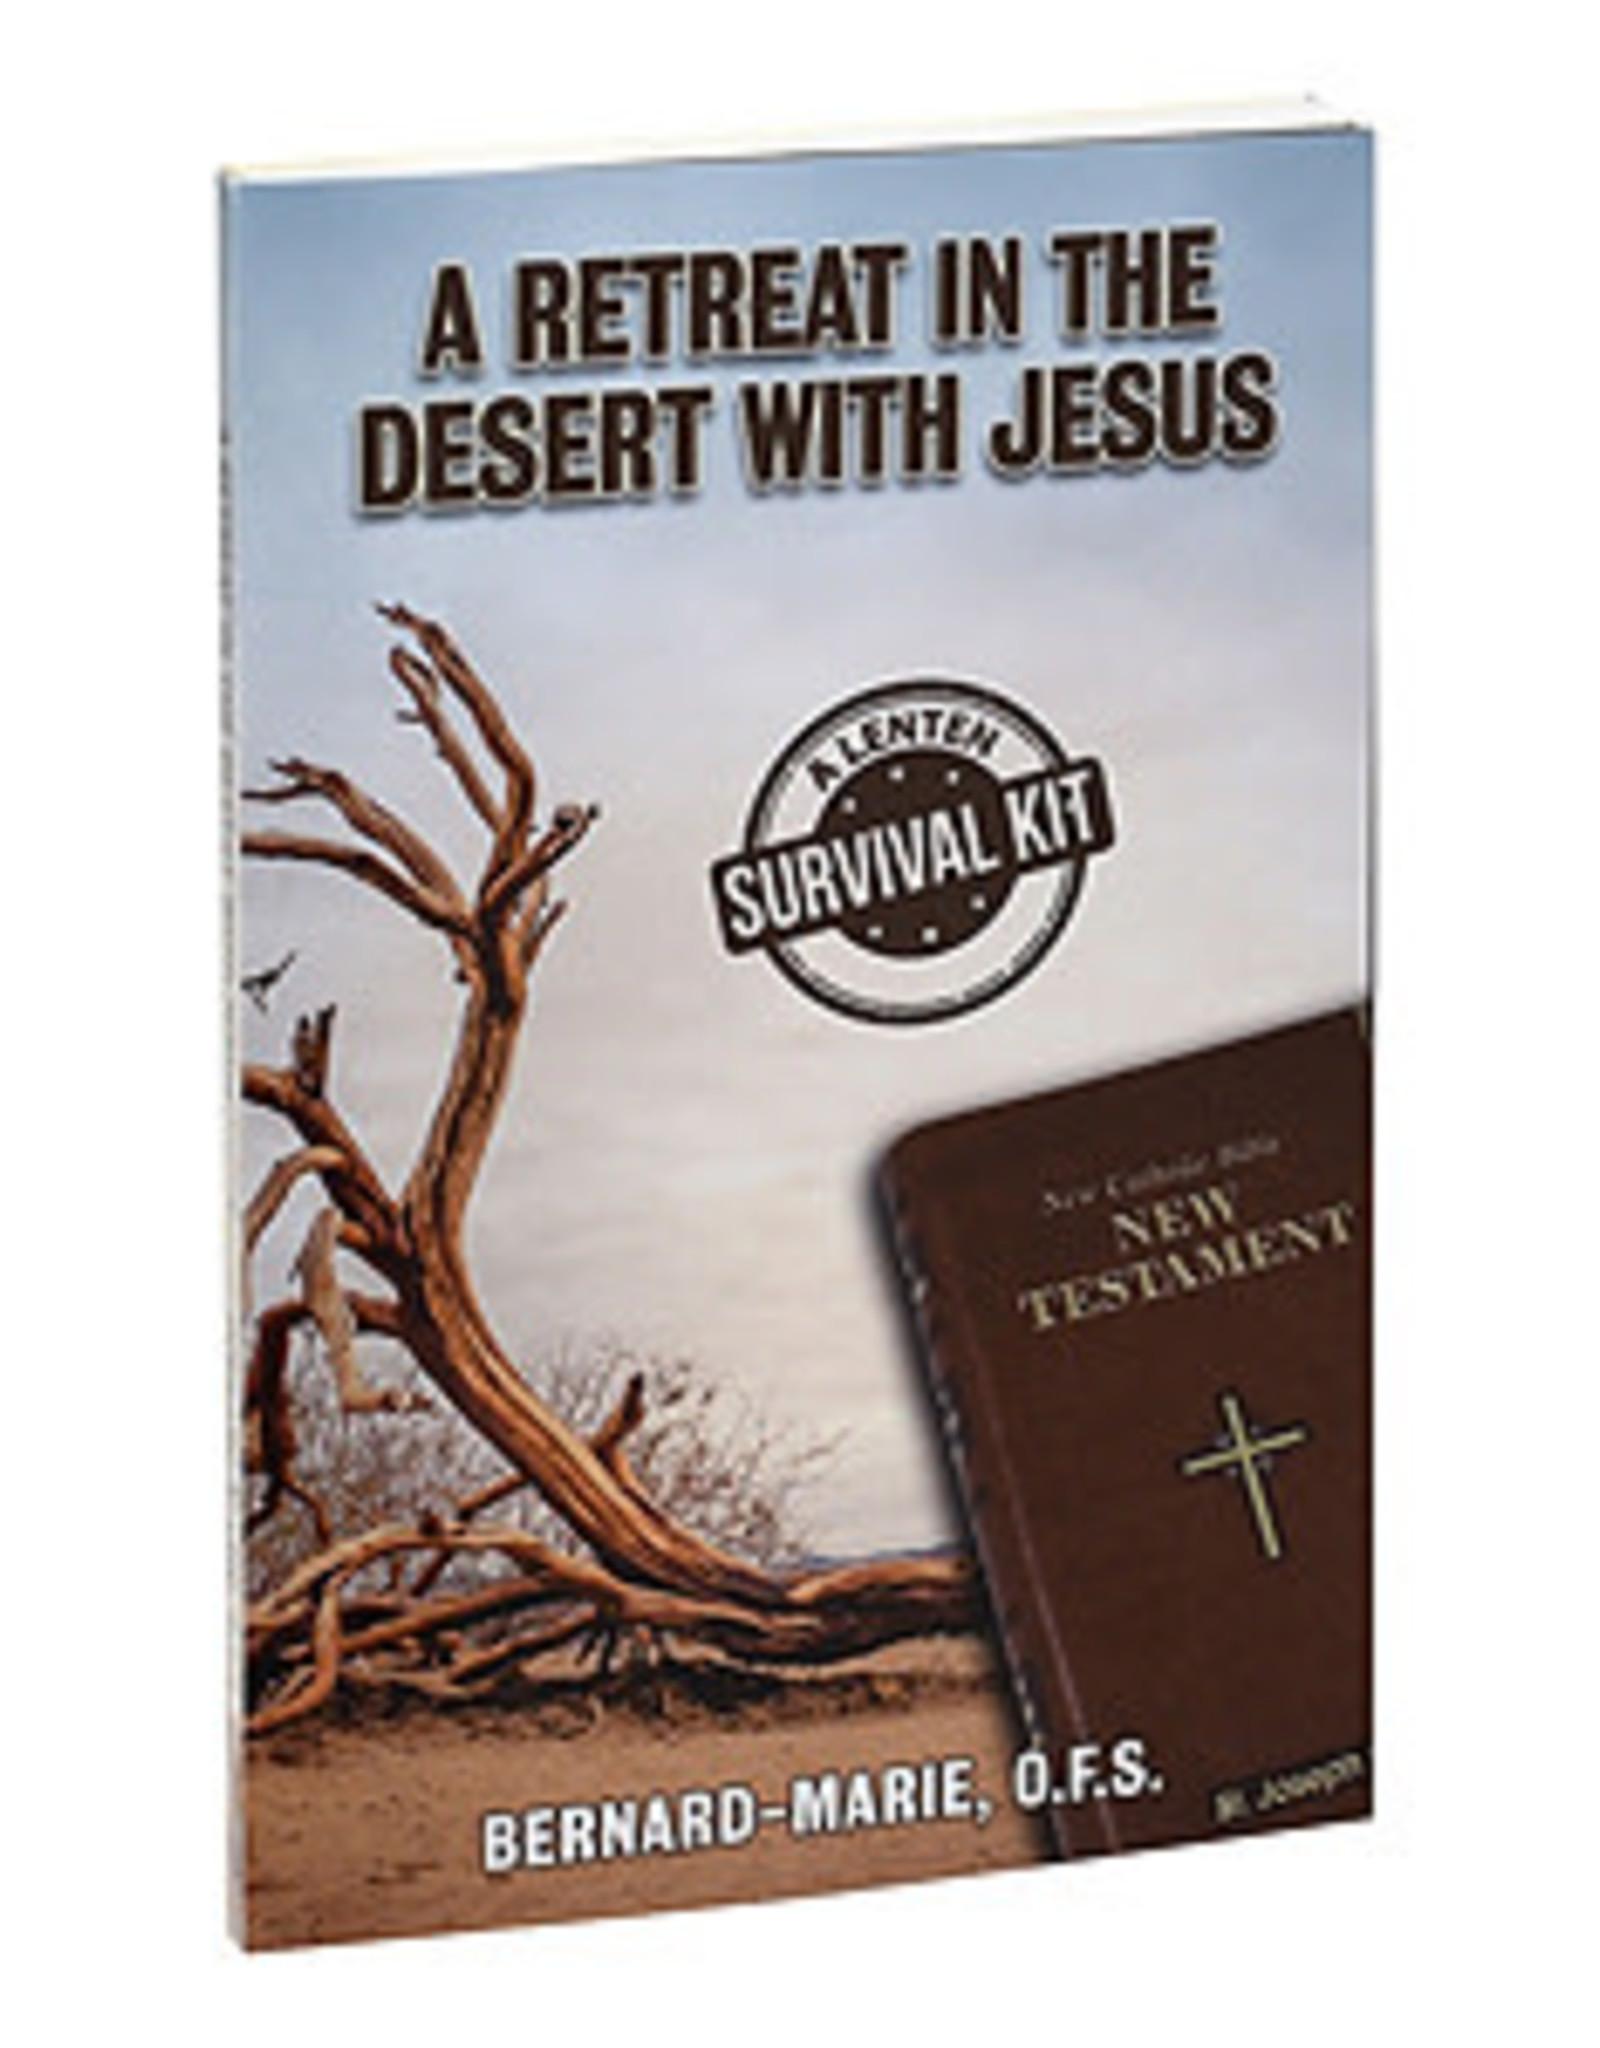 A Retreat in the Desert with Jesus:  A Lenten Survival Kit, by Bernard-Marie (paperback)